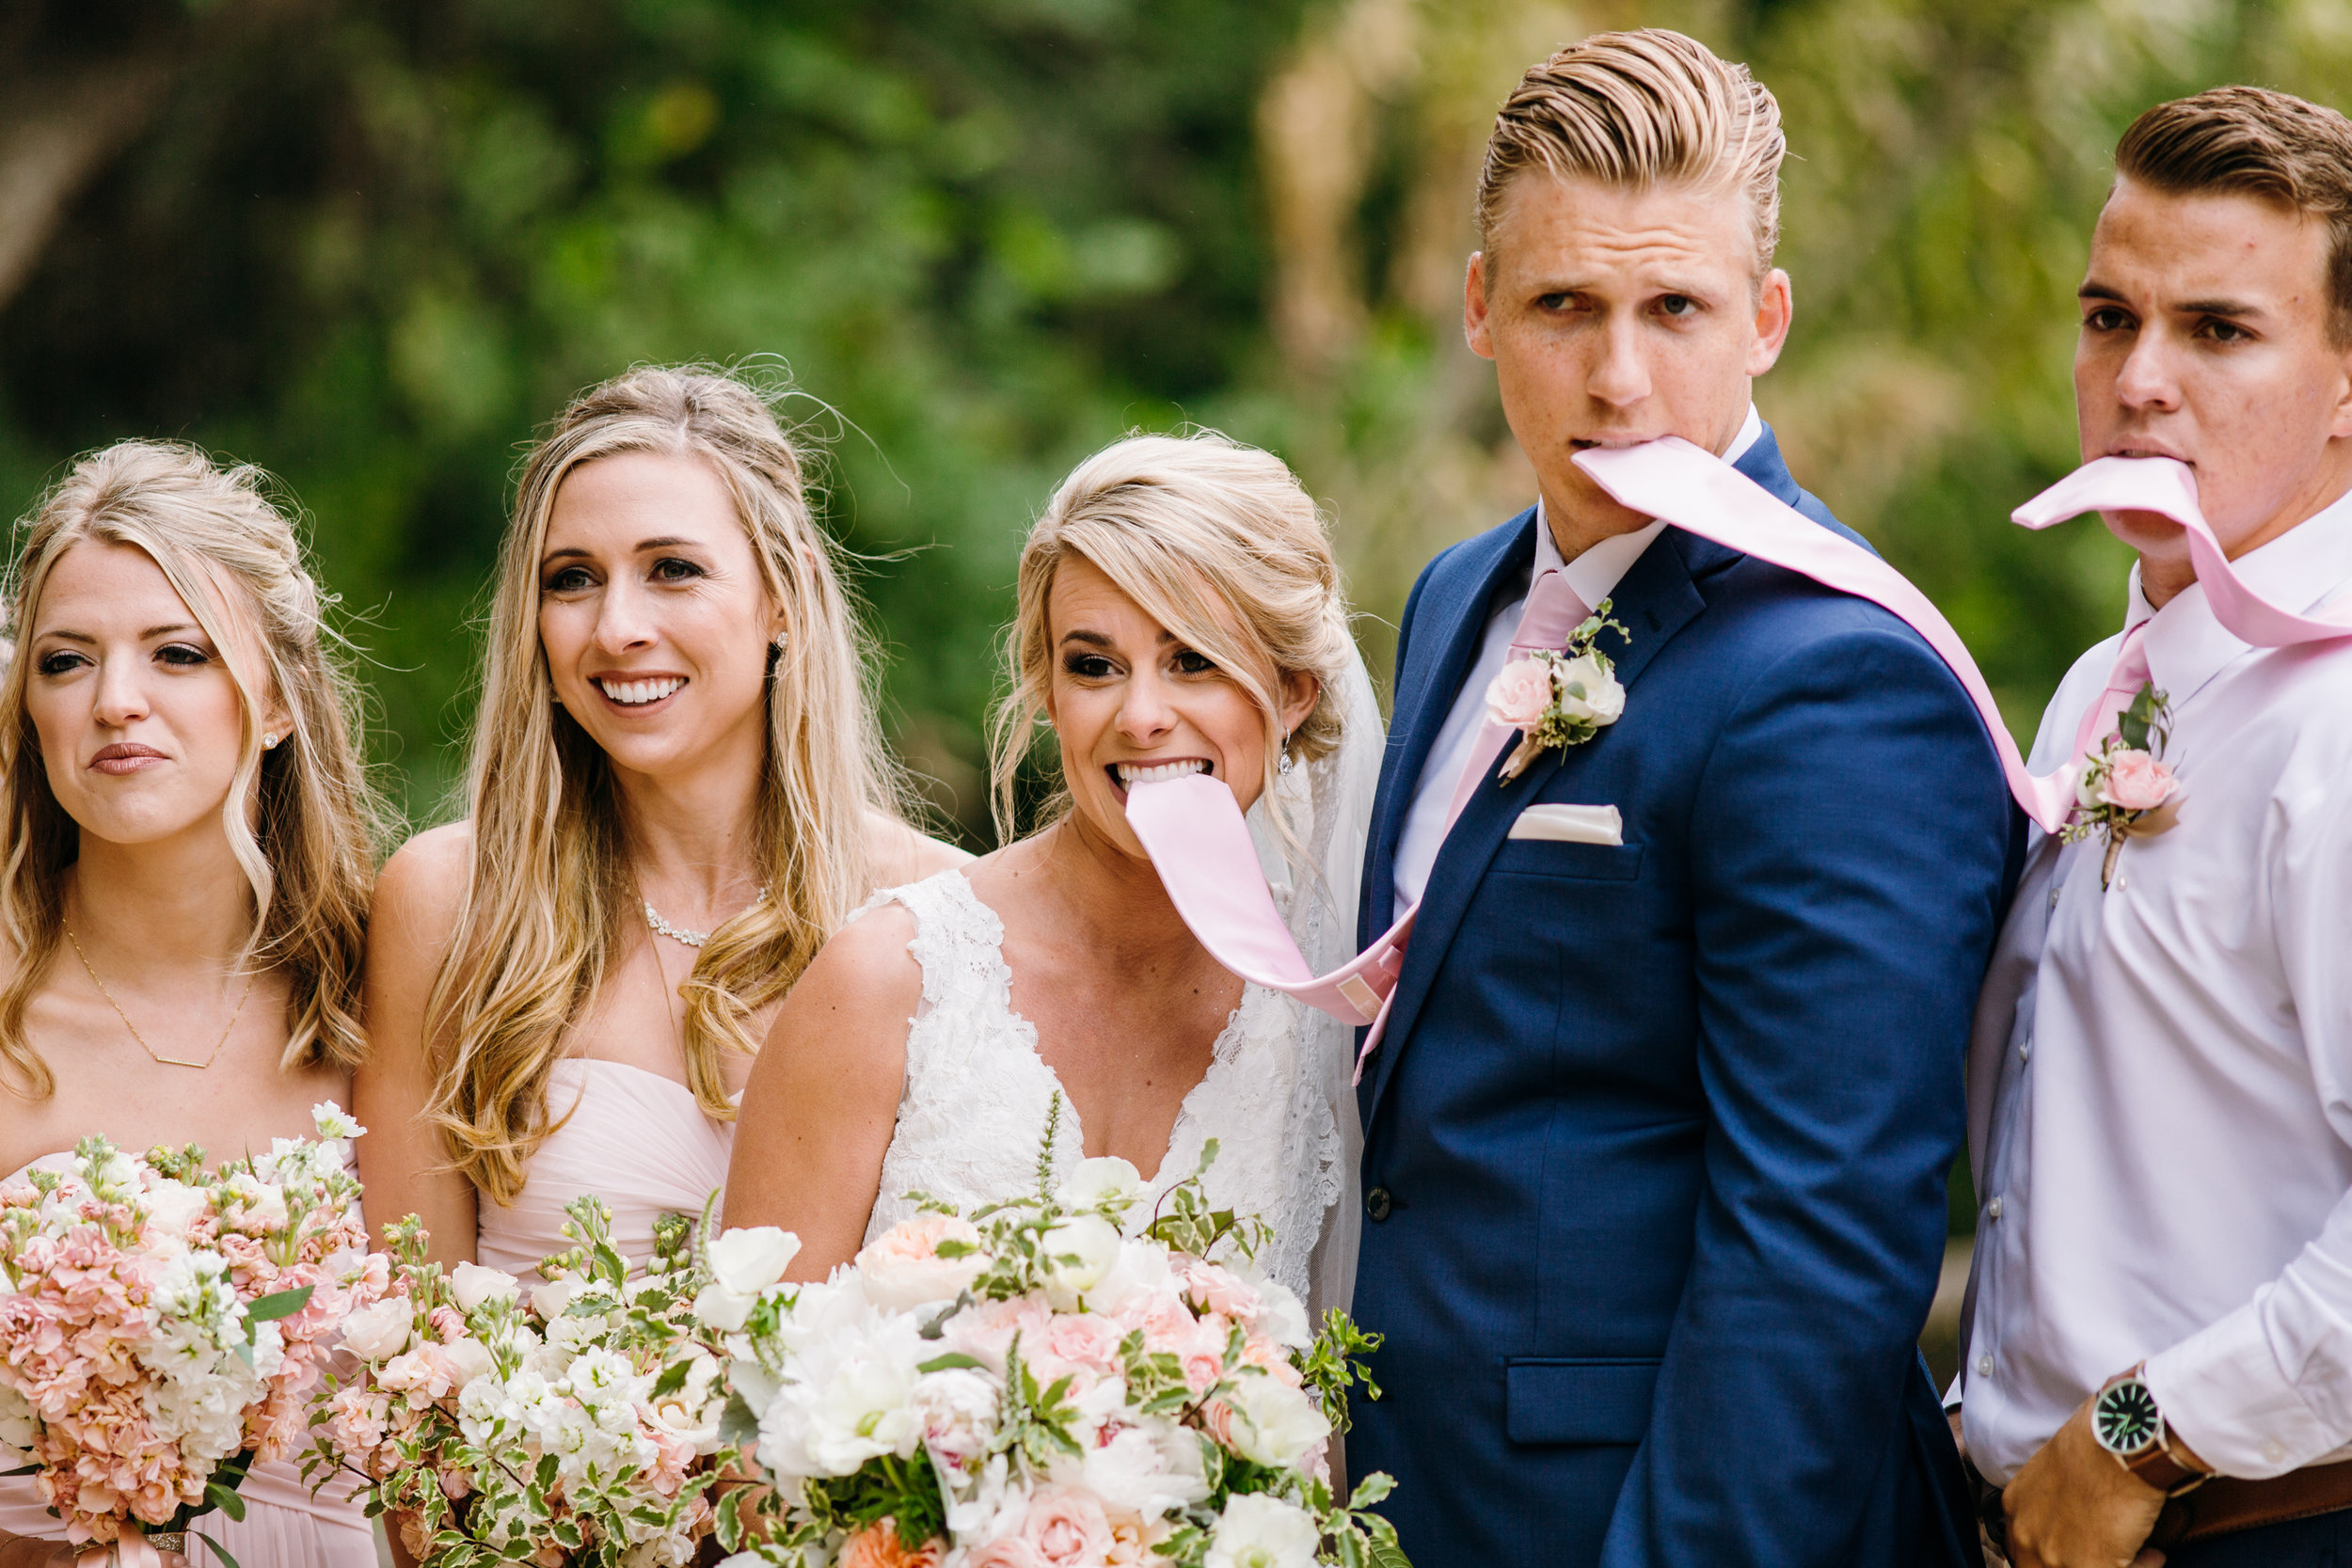 KaraNixonWeddings-LakeOakMeadows-Temecula-Wedding-20.jpg